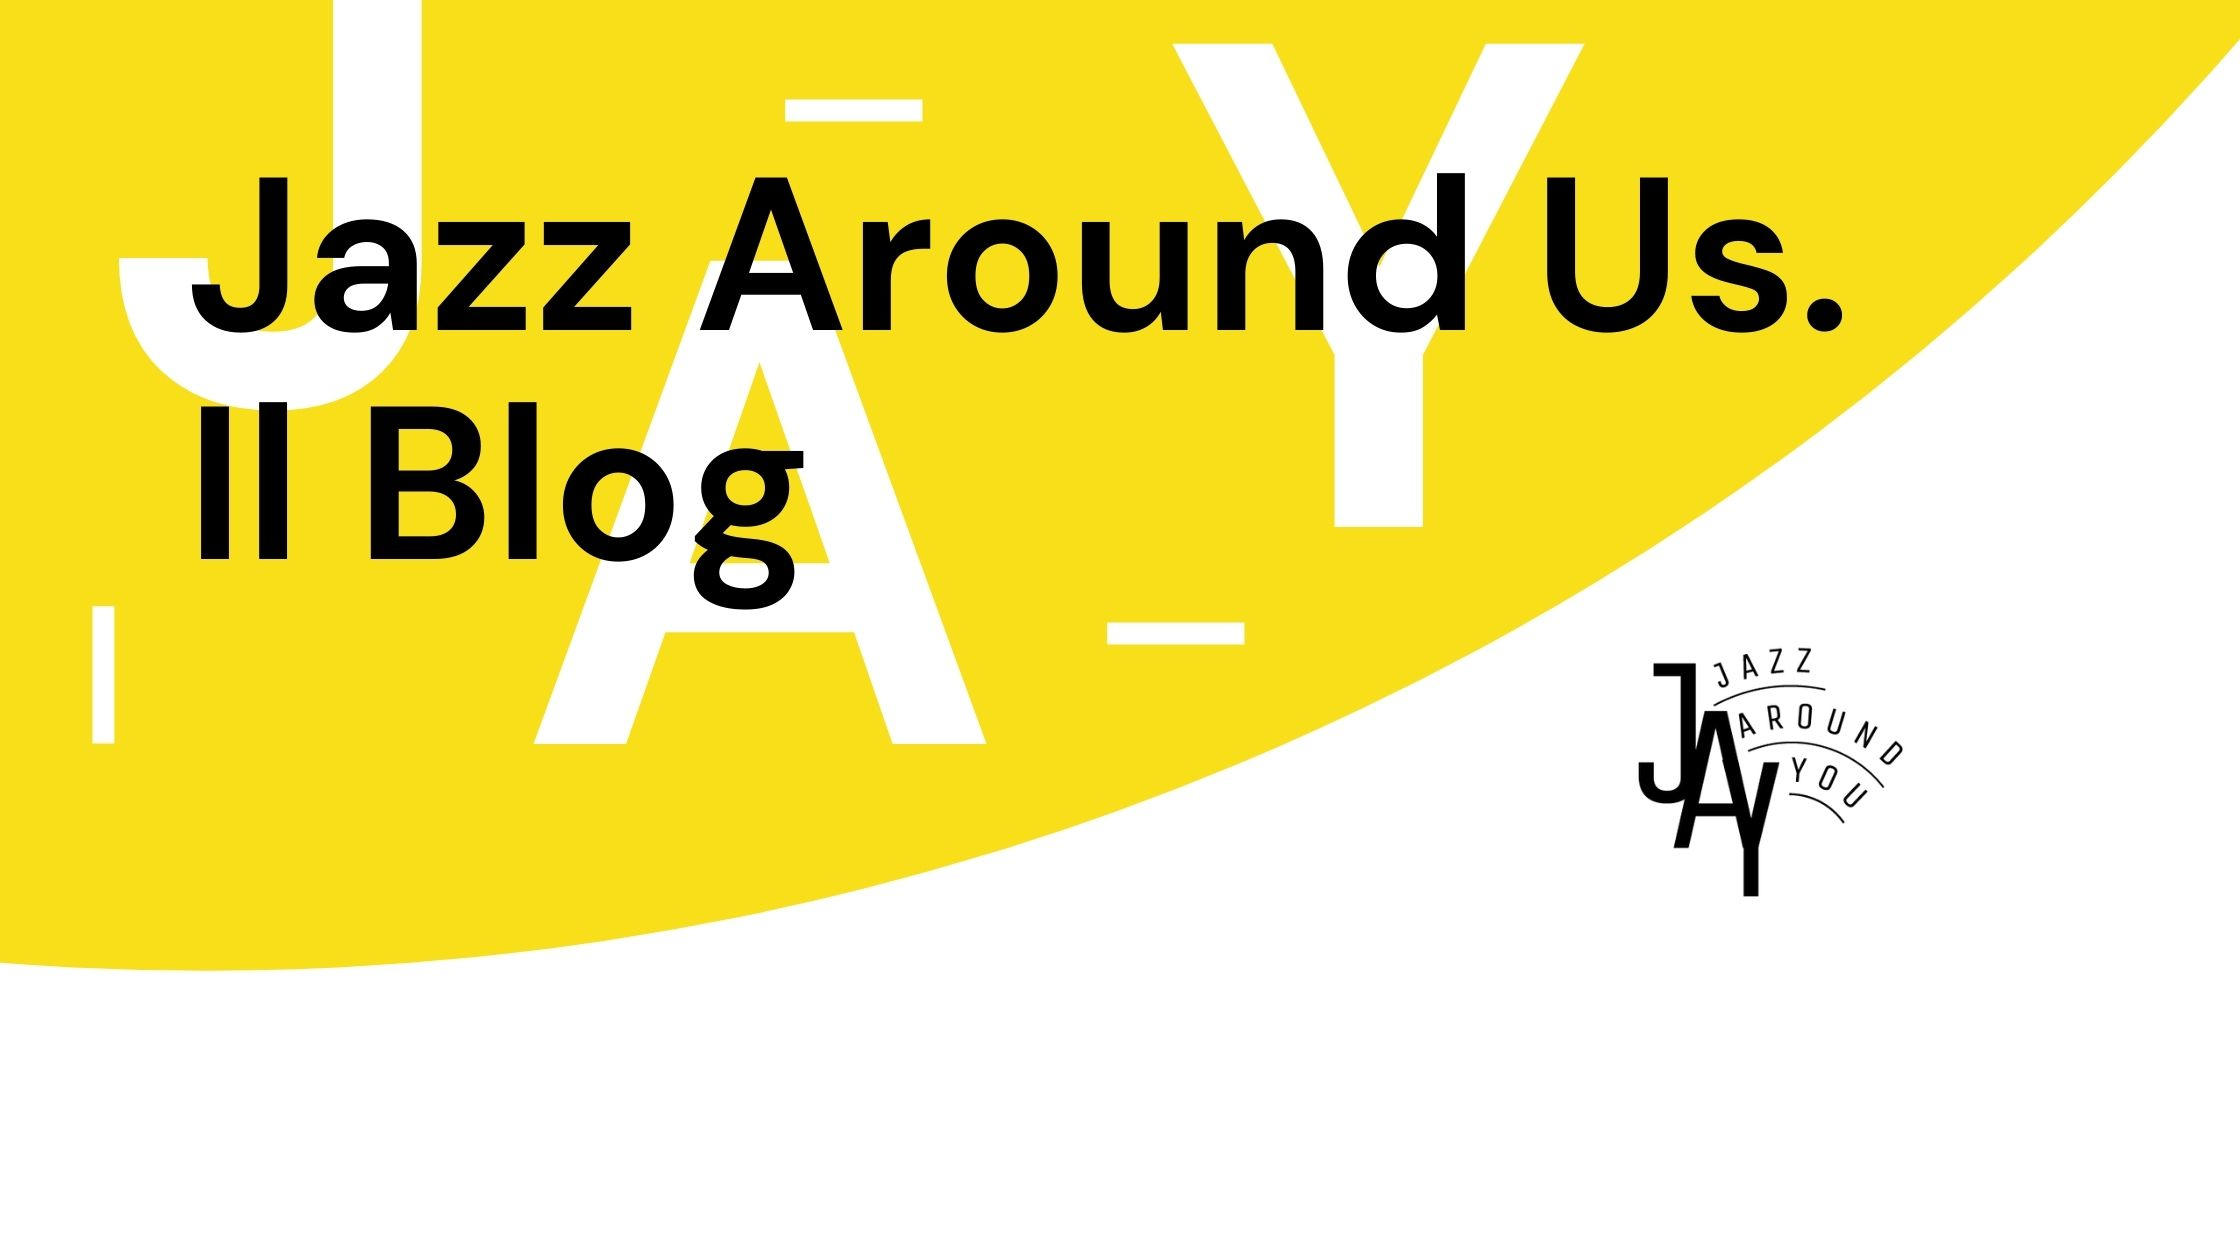 Blo-Jazz-Around-You